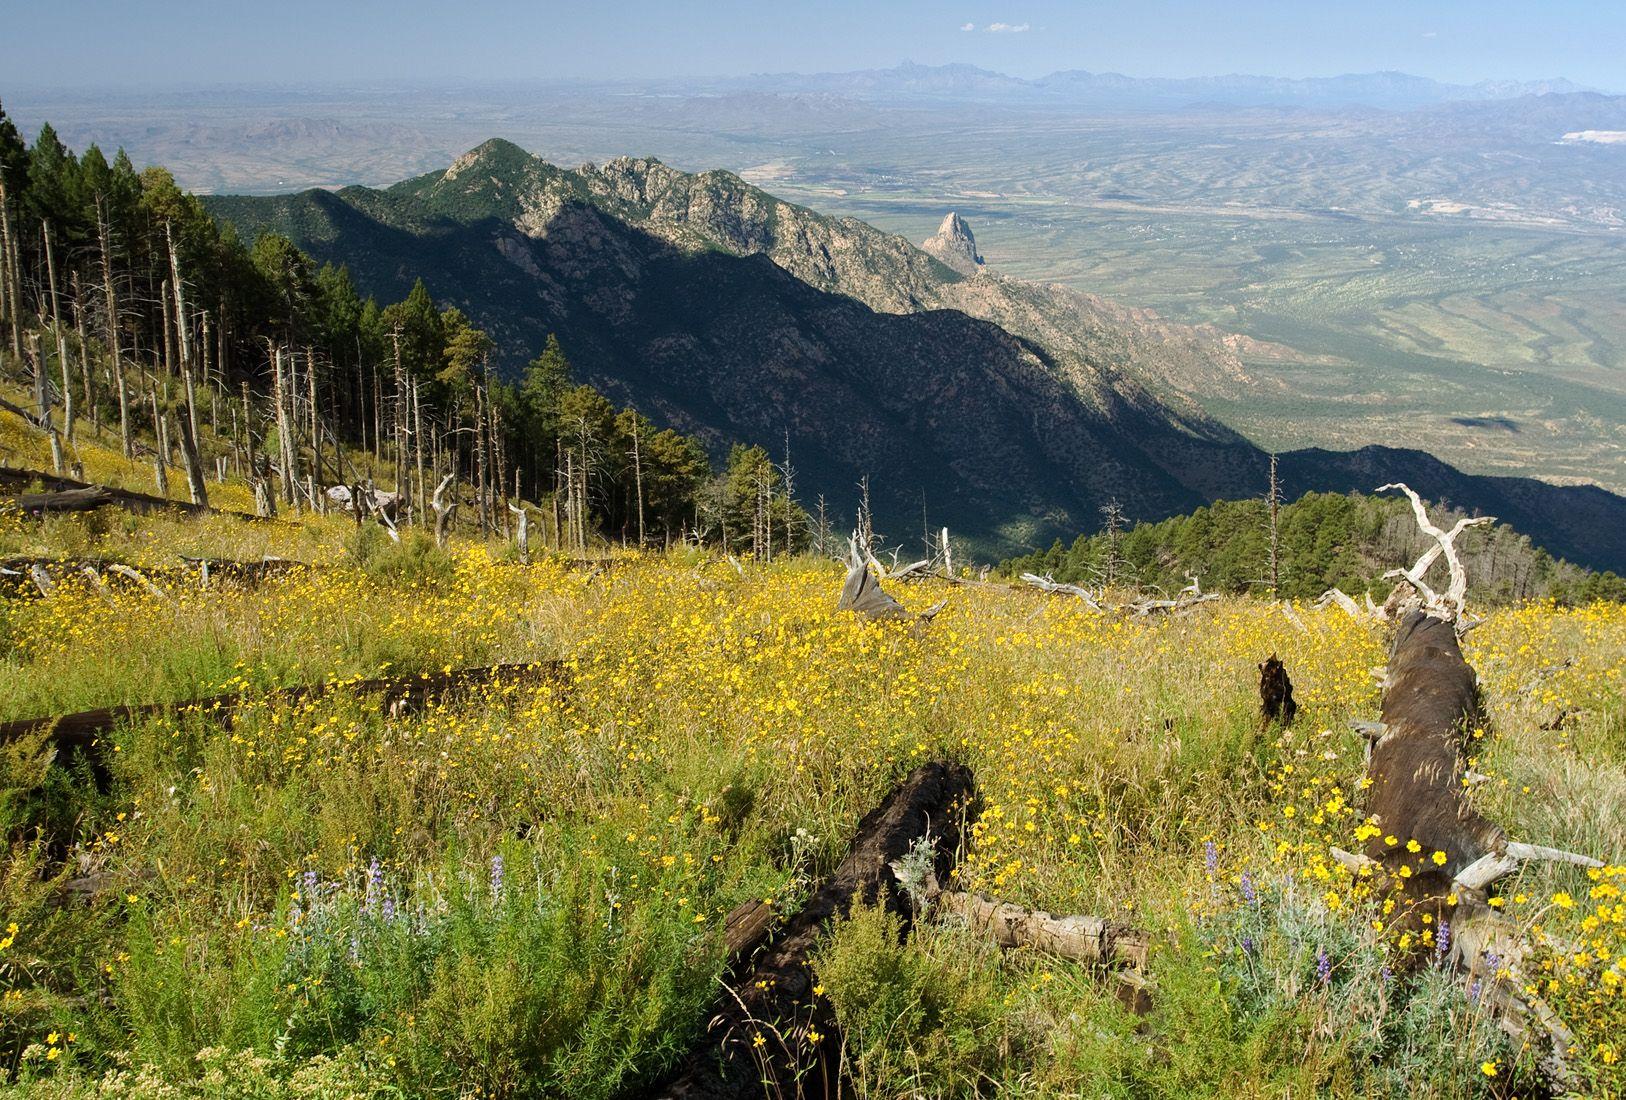 Crest Trail View Across Madera Canyon, Santa Rita Mtns, AZ